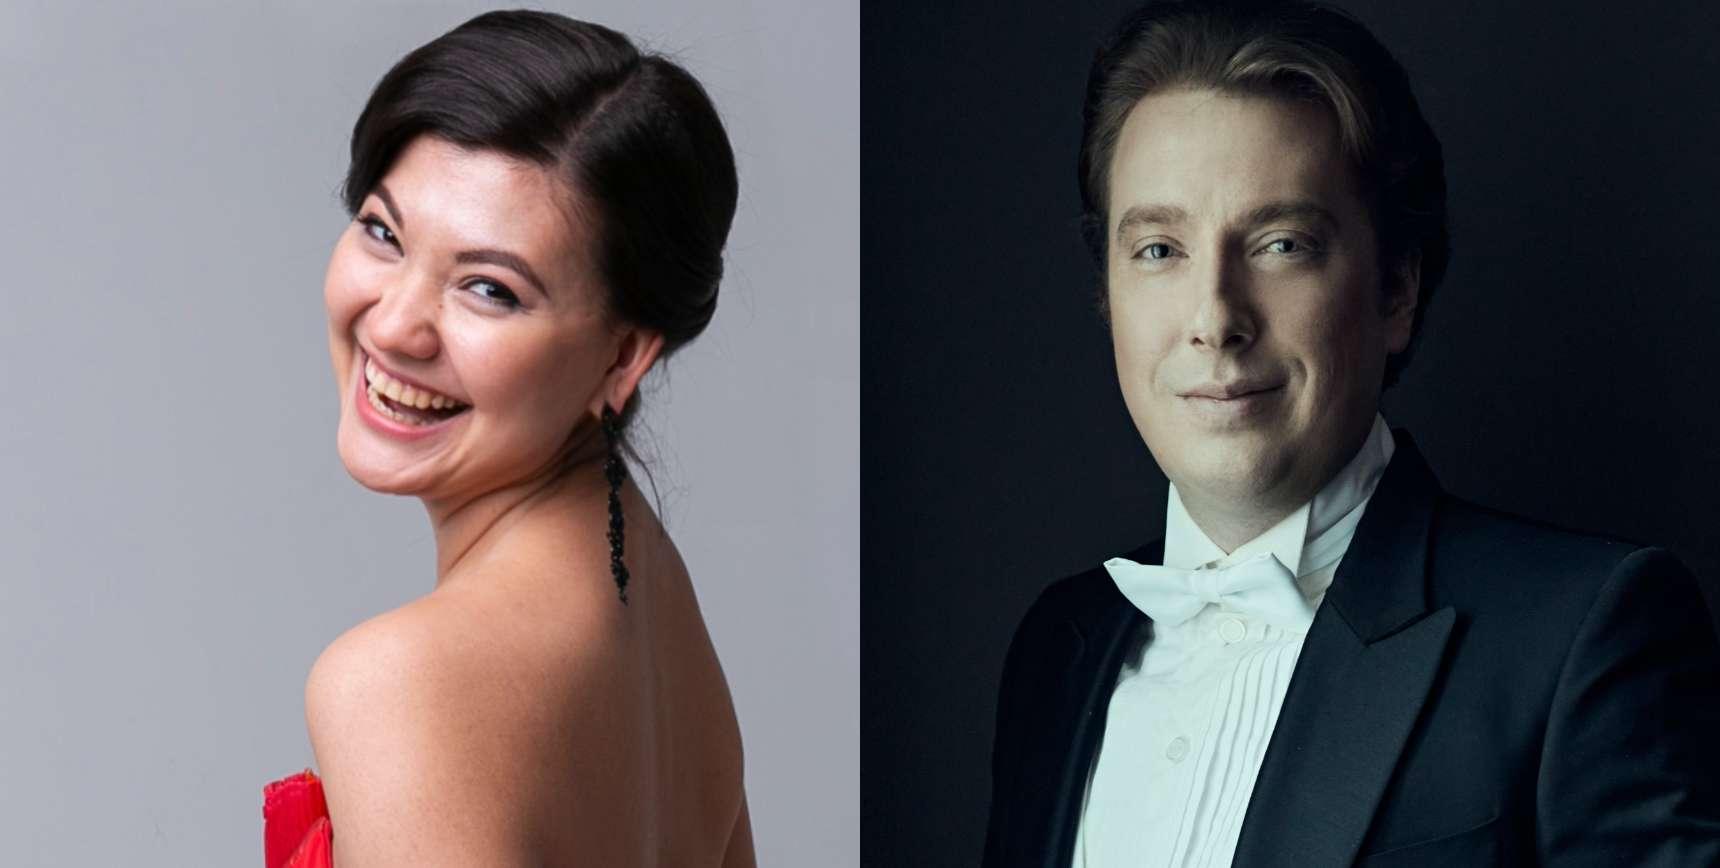 Aigul Akmetshina & Boris Pinkhasovich at Baden-Baden Easter Festival 2022